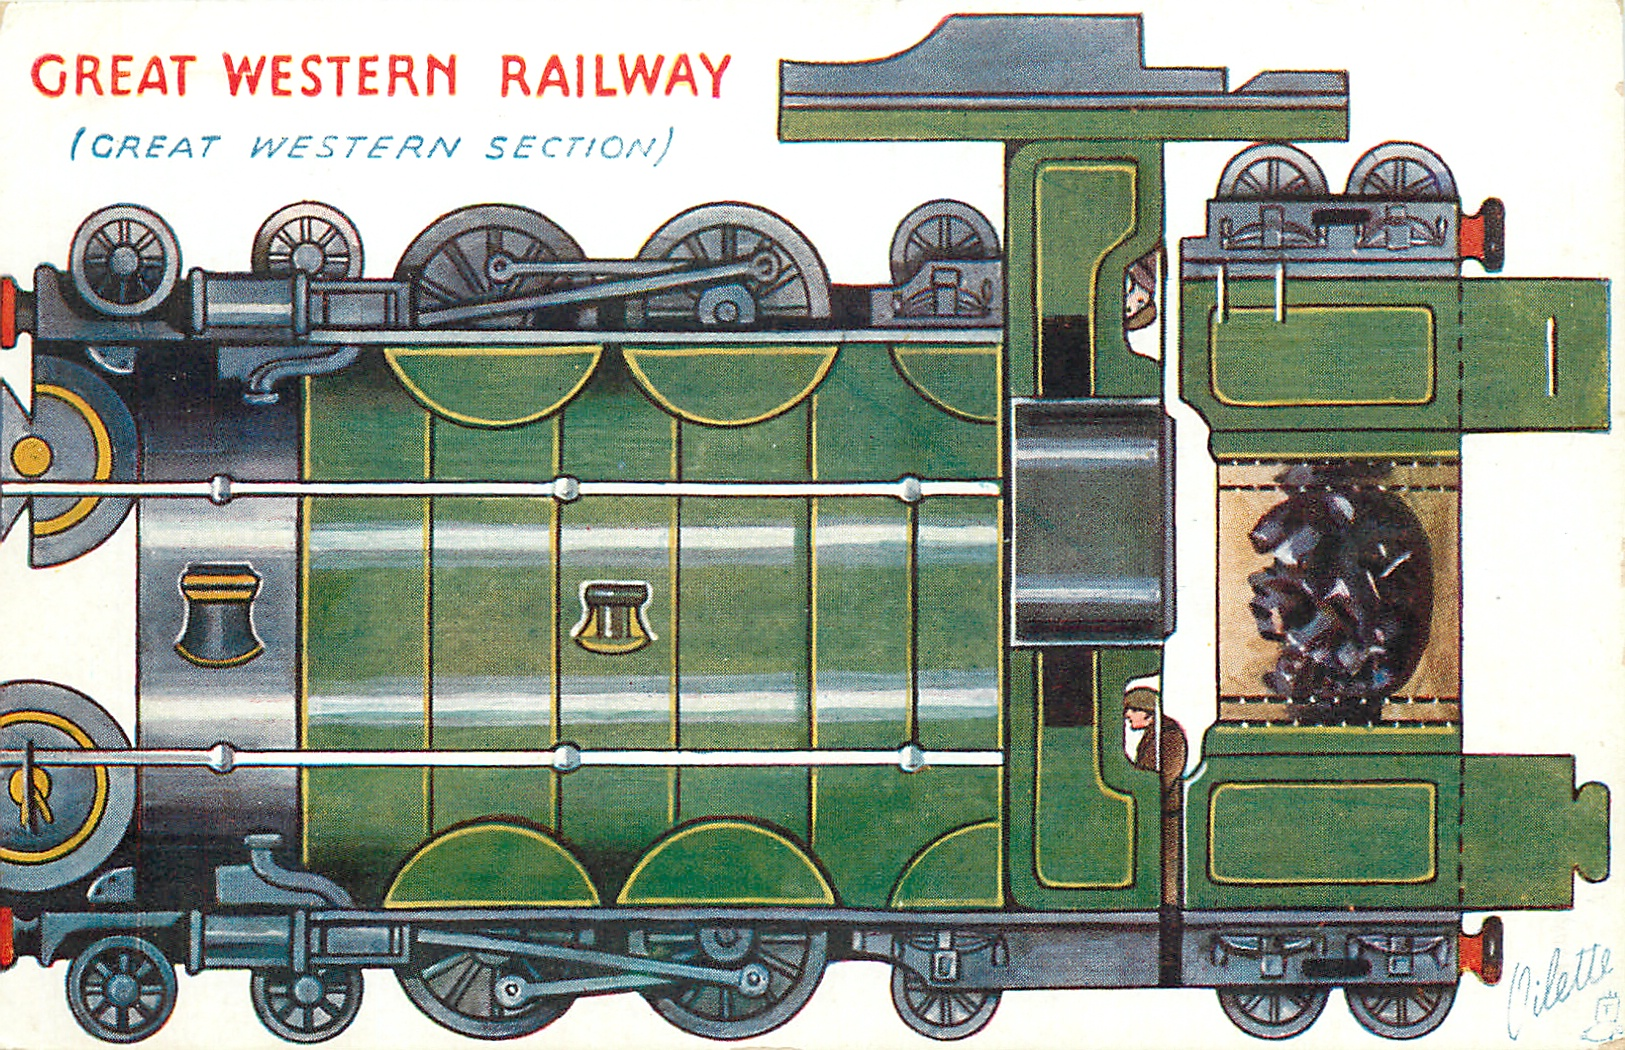 GREAT WESTERN RAILWAY (GREAT WESTERN SECTION)